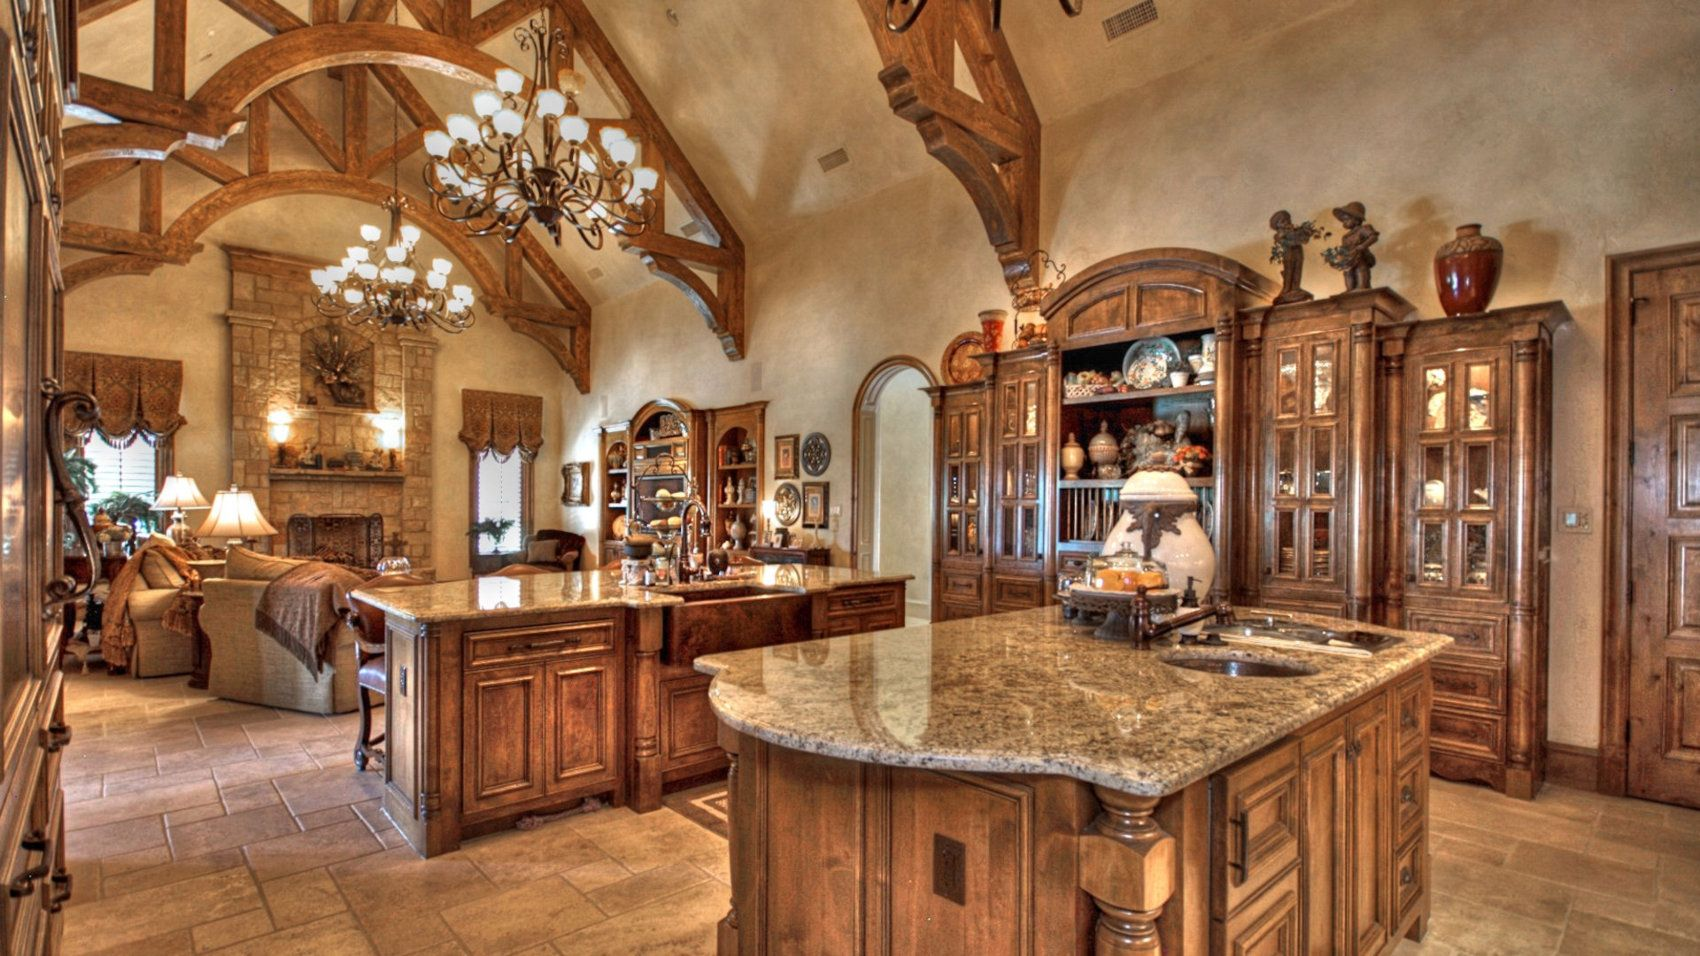 Best Kitchen Design Adorable Castle Kitchen Design With Big 400 x 300